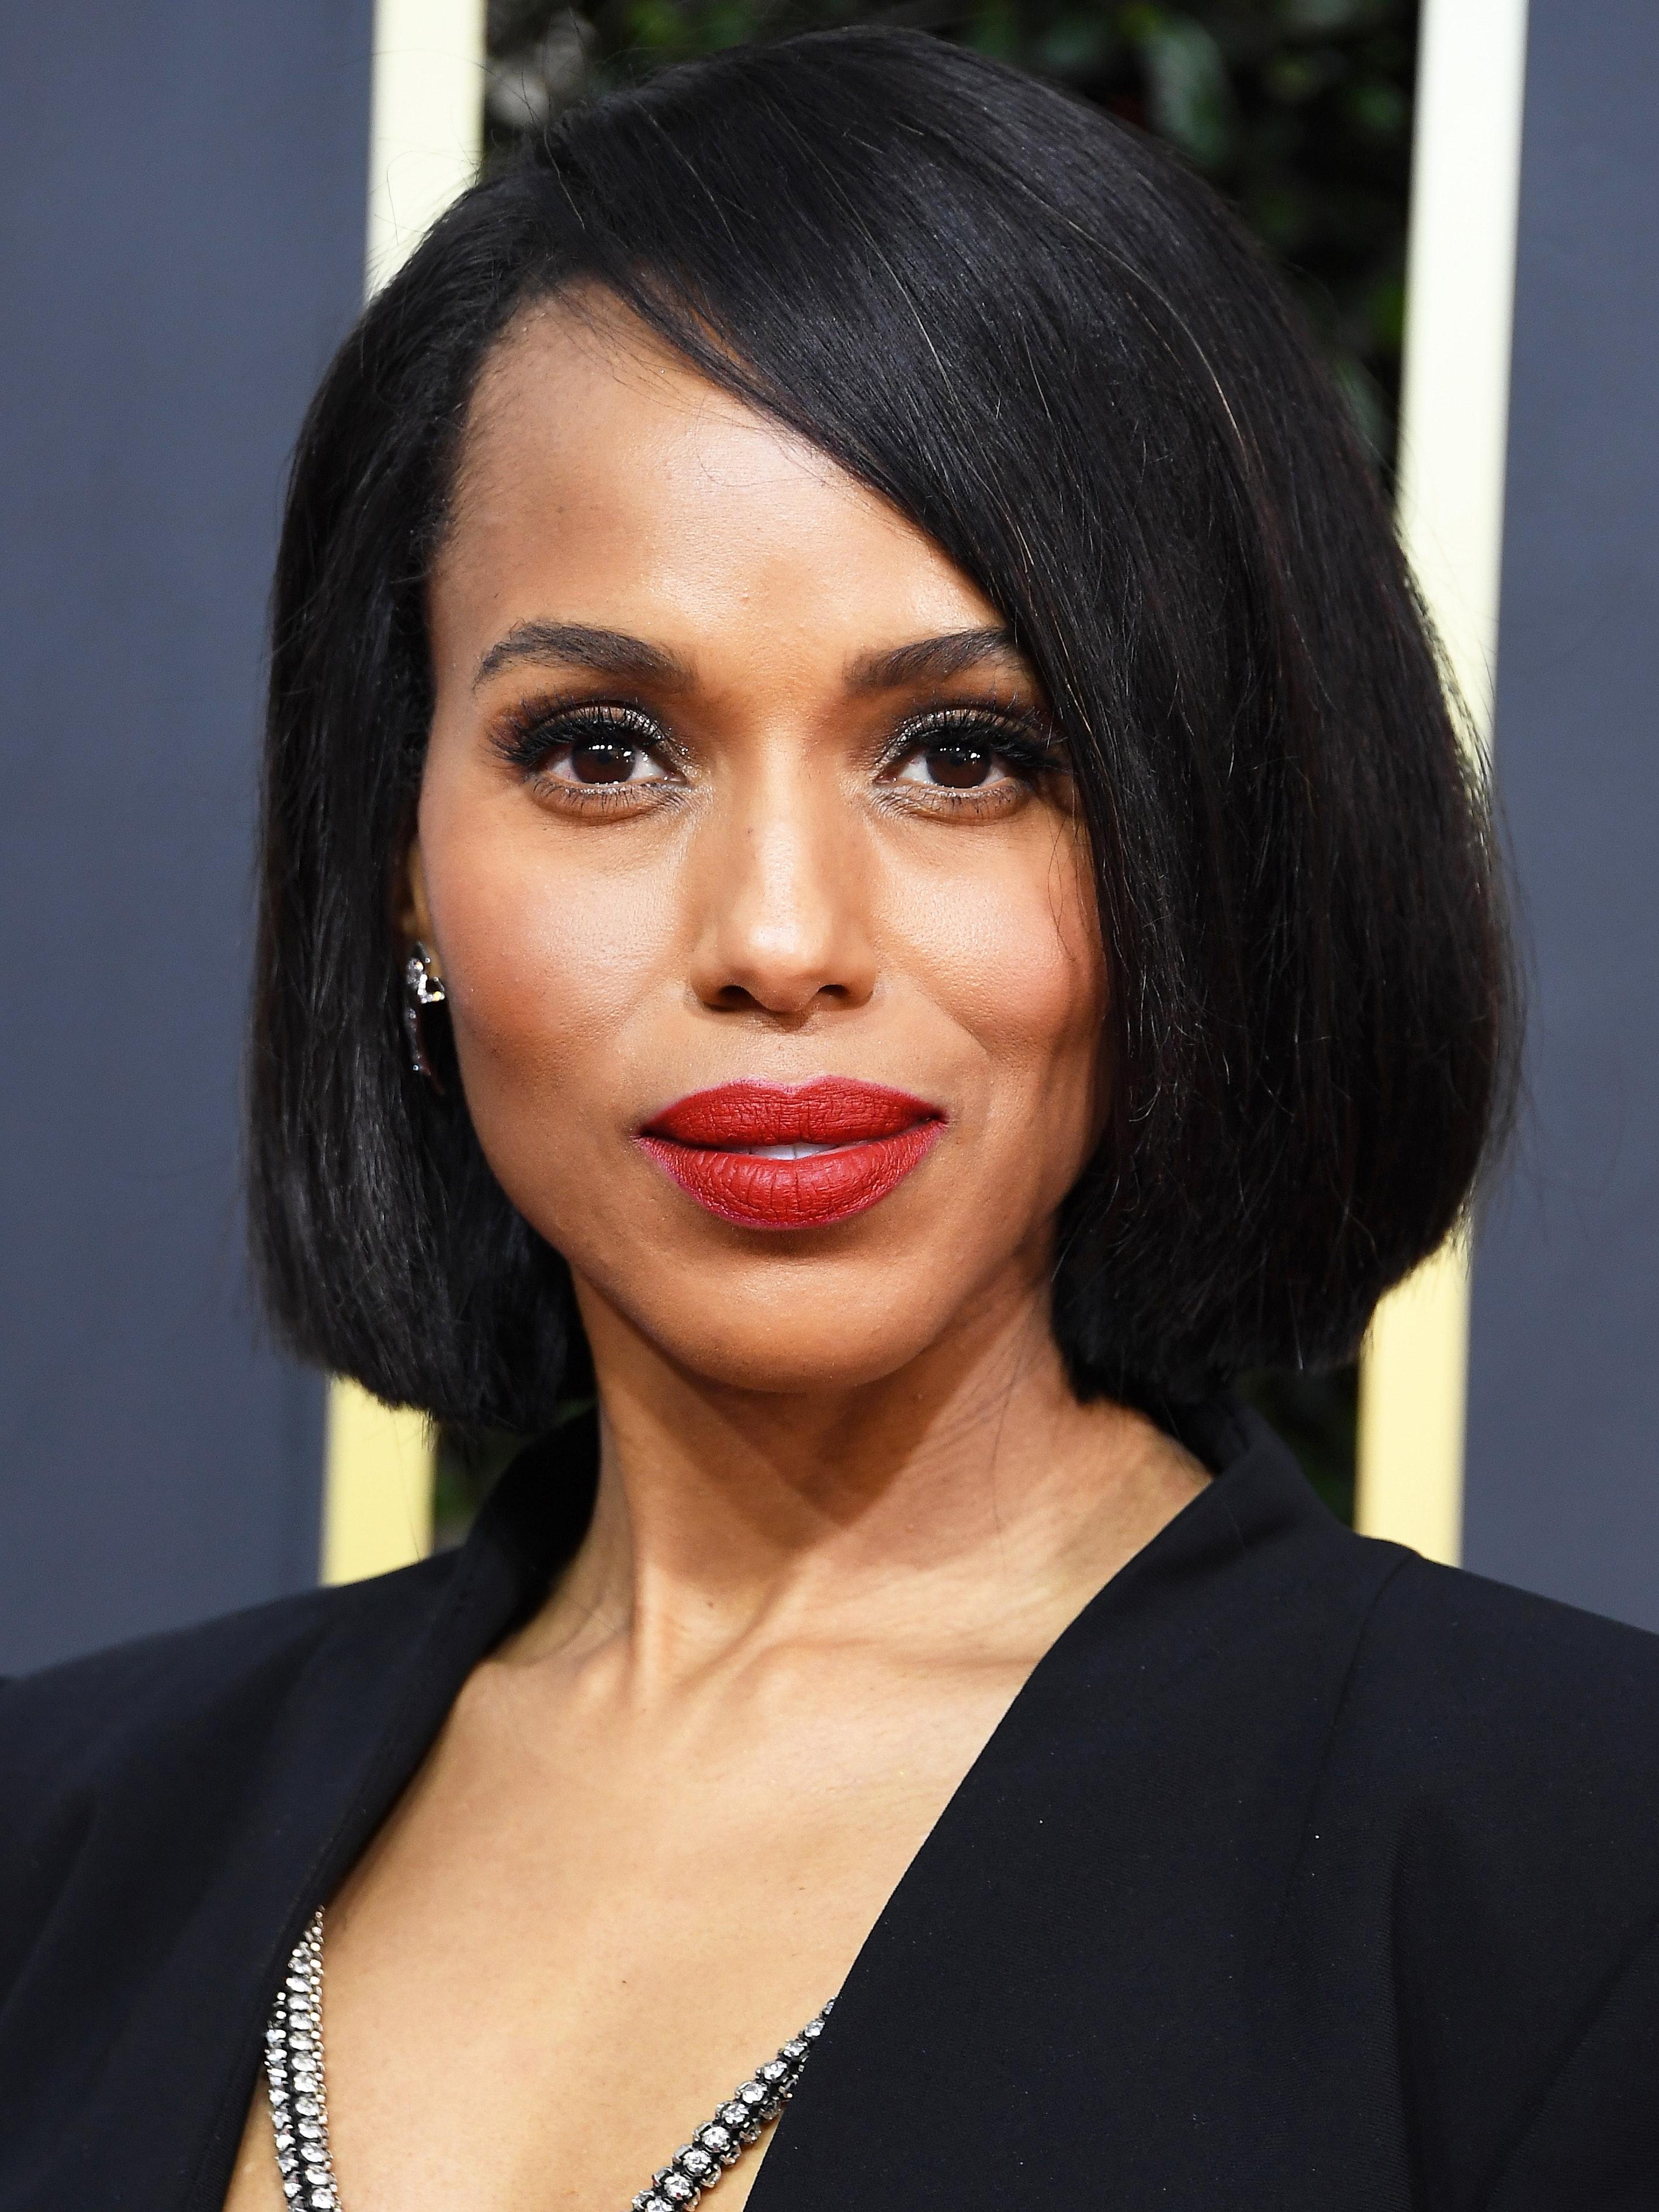 Kerry Washington Golden Globes beauty look 2020